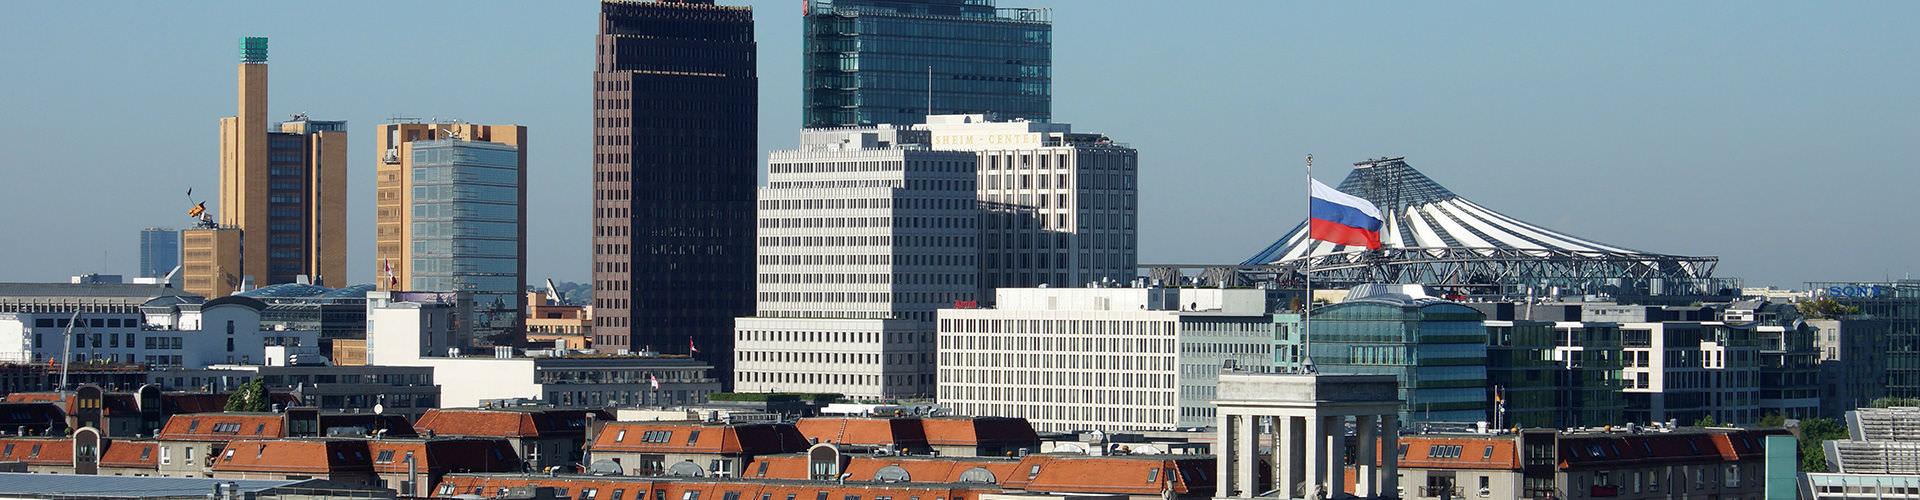 Berlín - Hostales cerca a Potsdamer Platz. Mapas de Berlín, Fotos y comentarios de cada Hostal en Berlín.